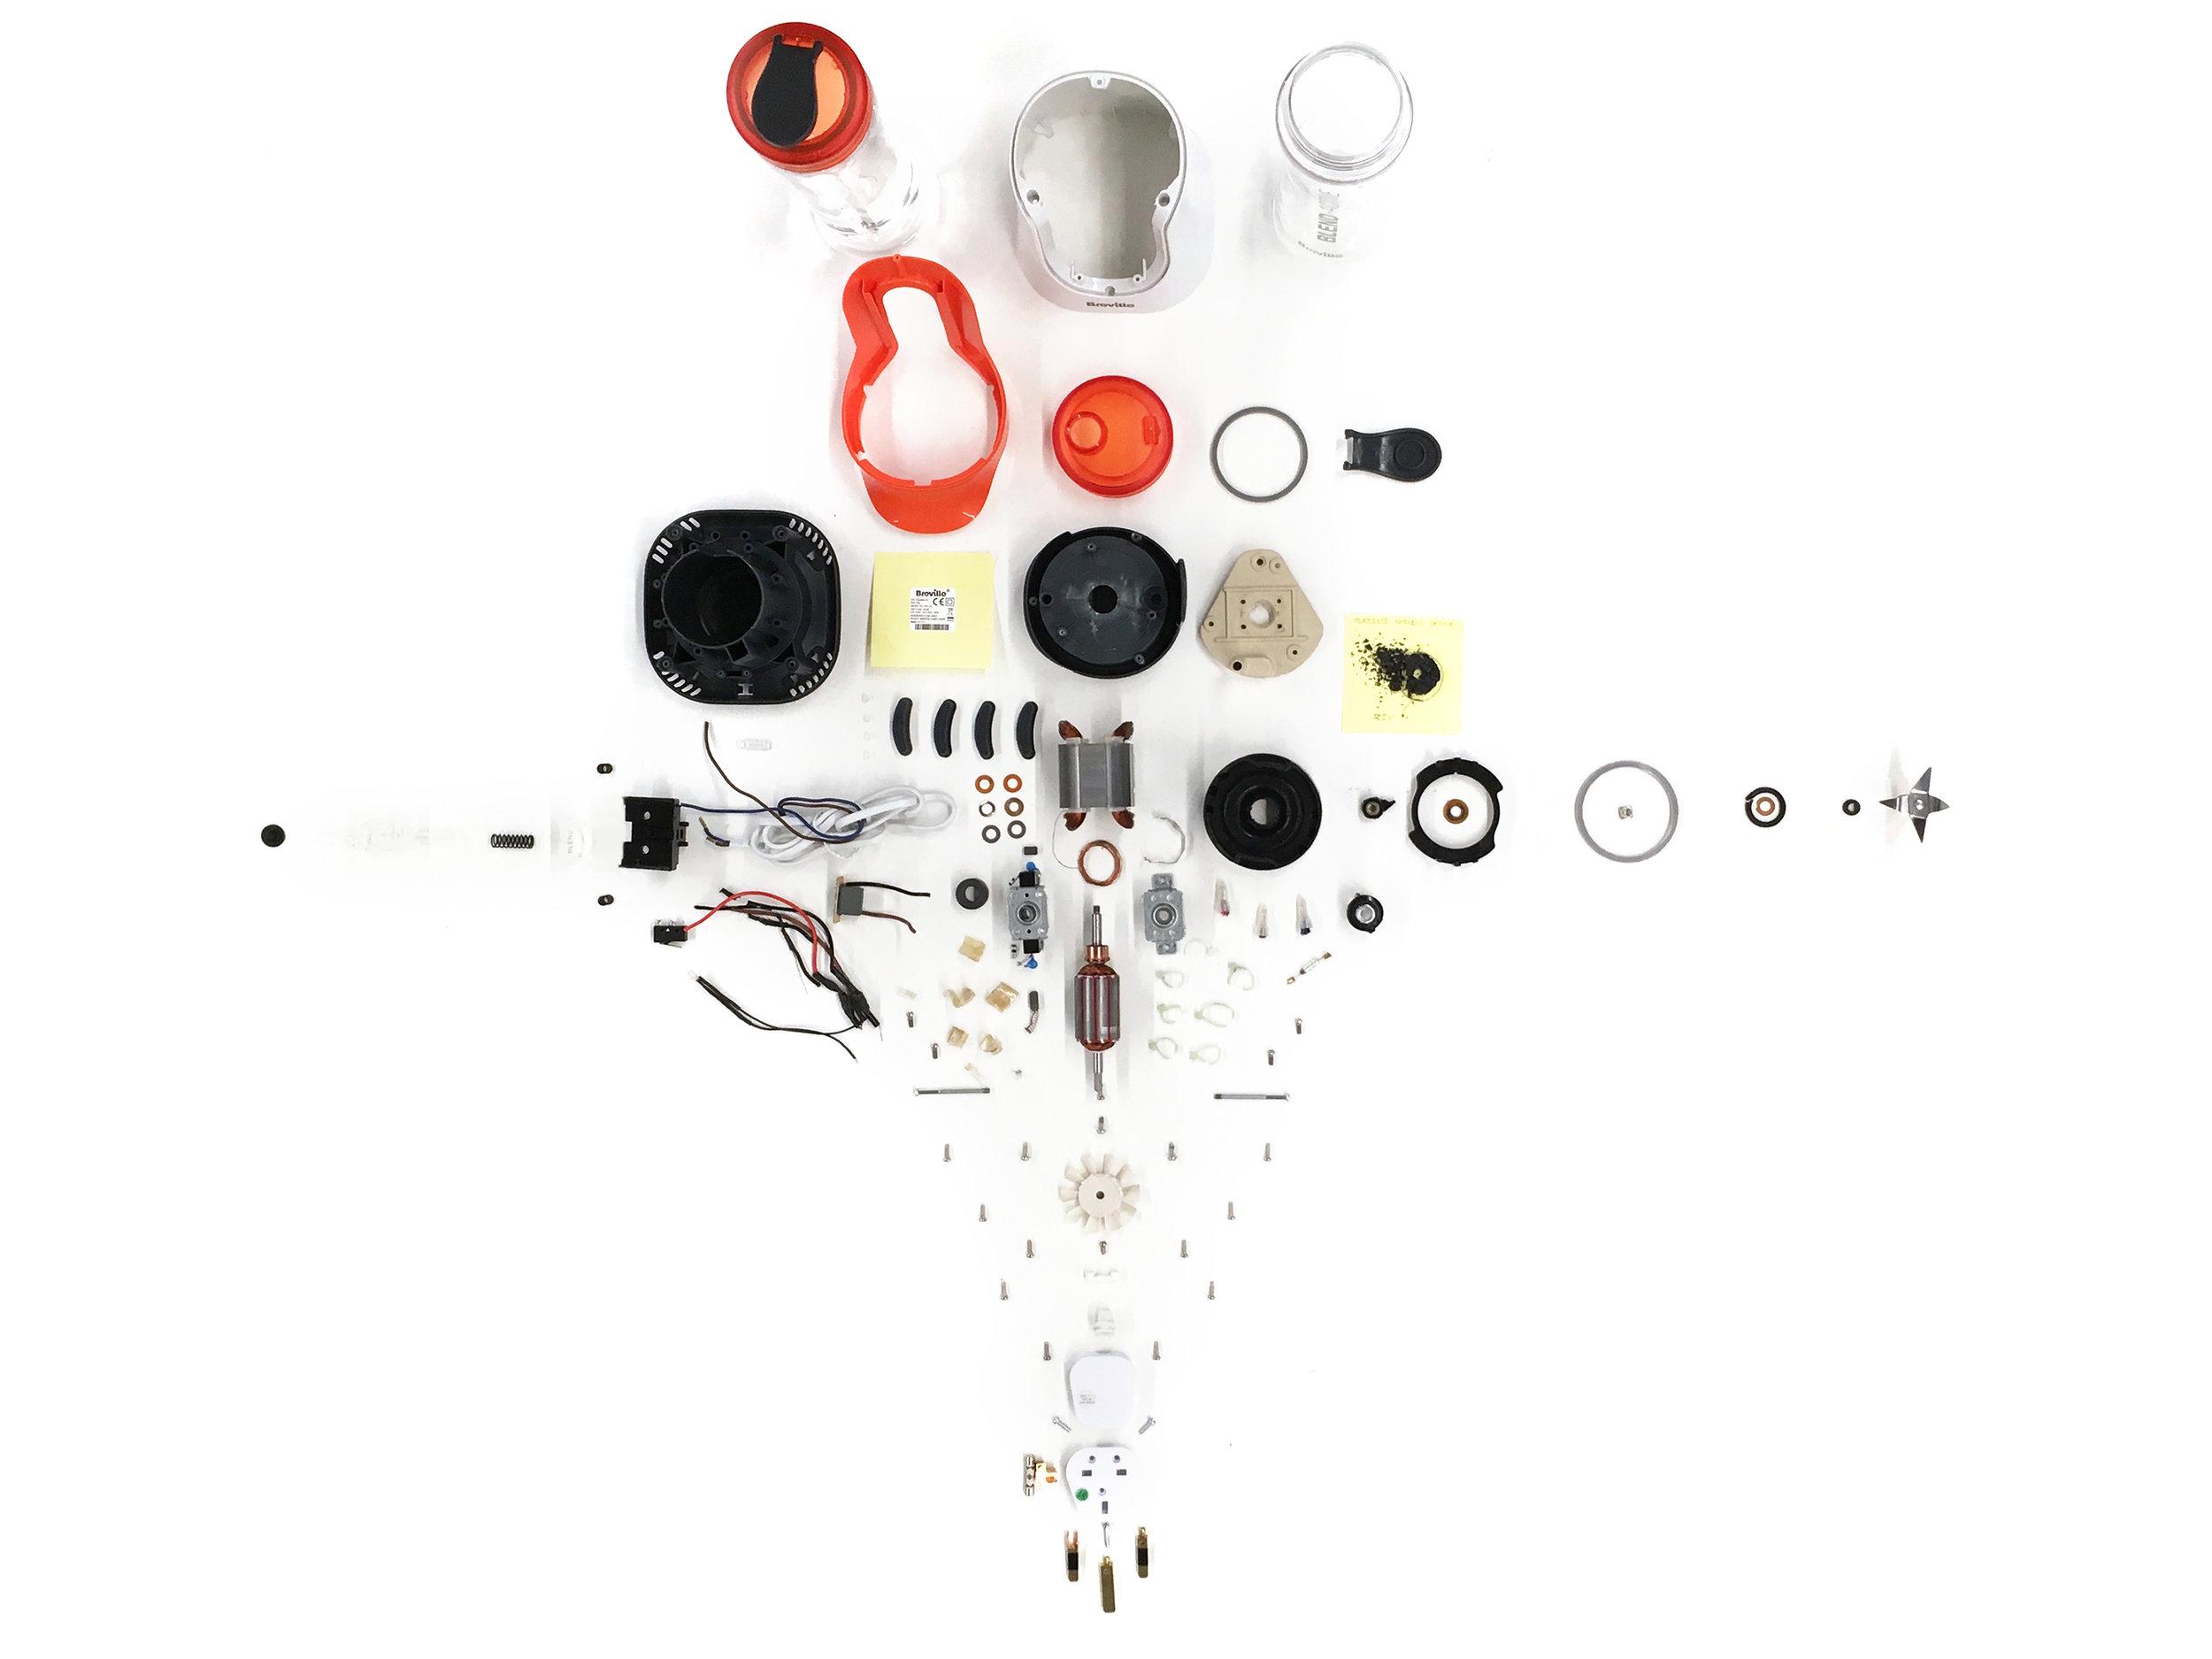 Blender Components Flatlay.jpg